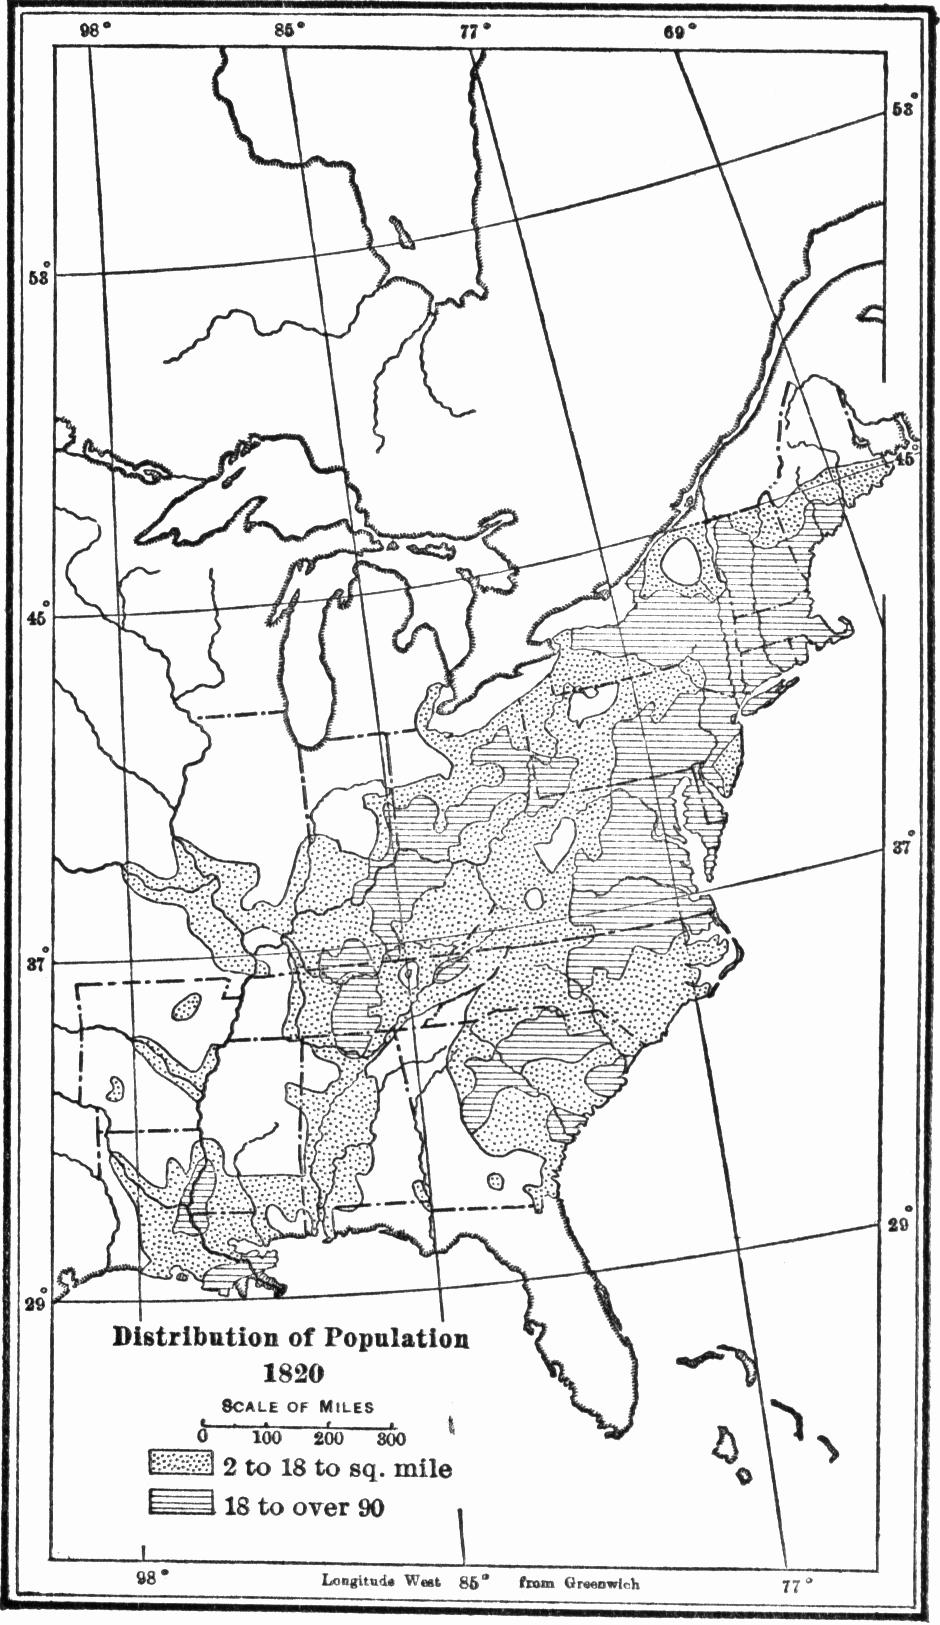 USA population distribution 1820